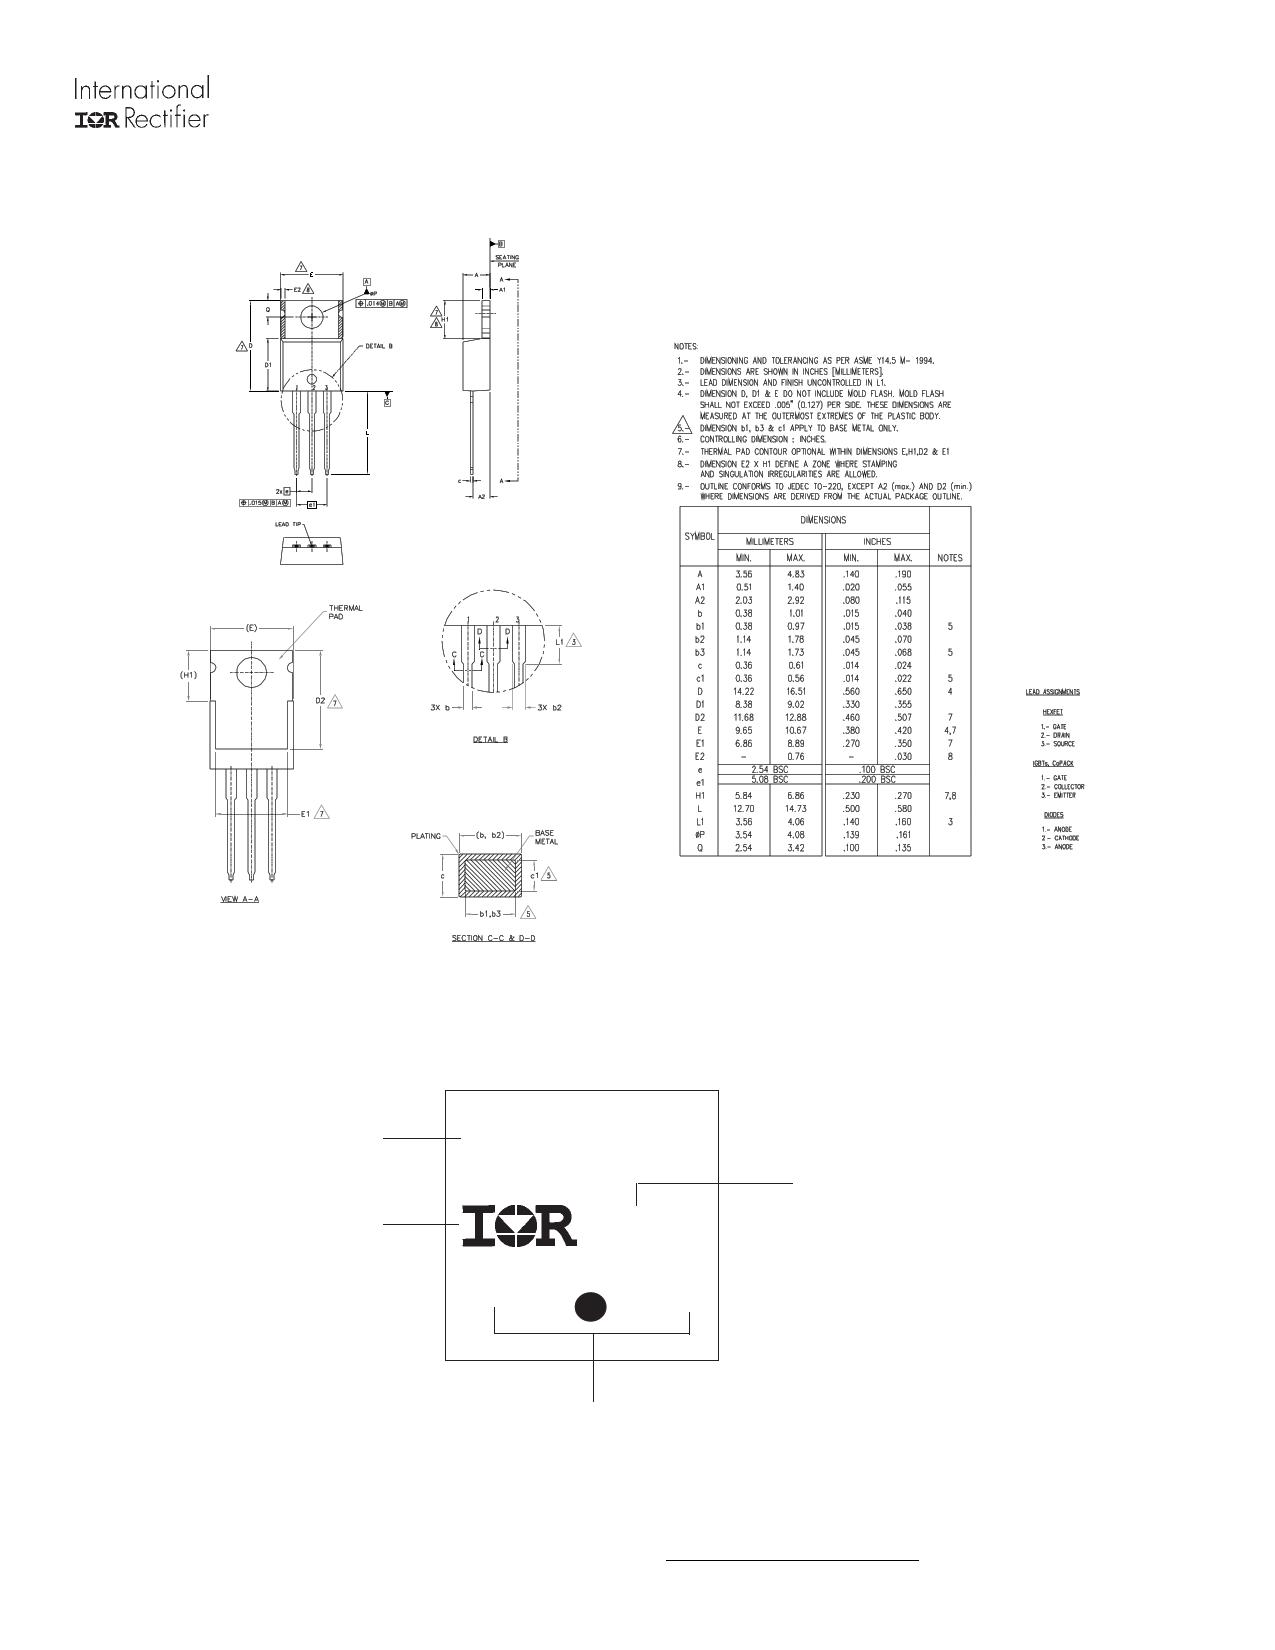 AUIRFB4410 diode, scr